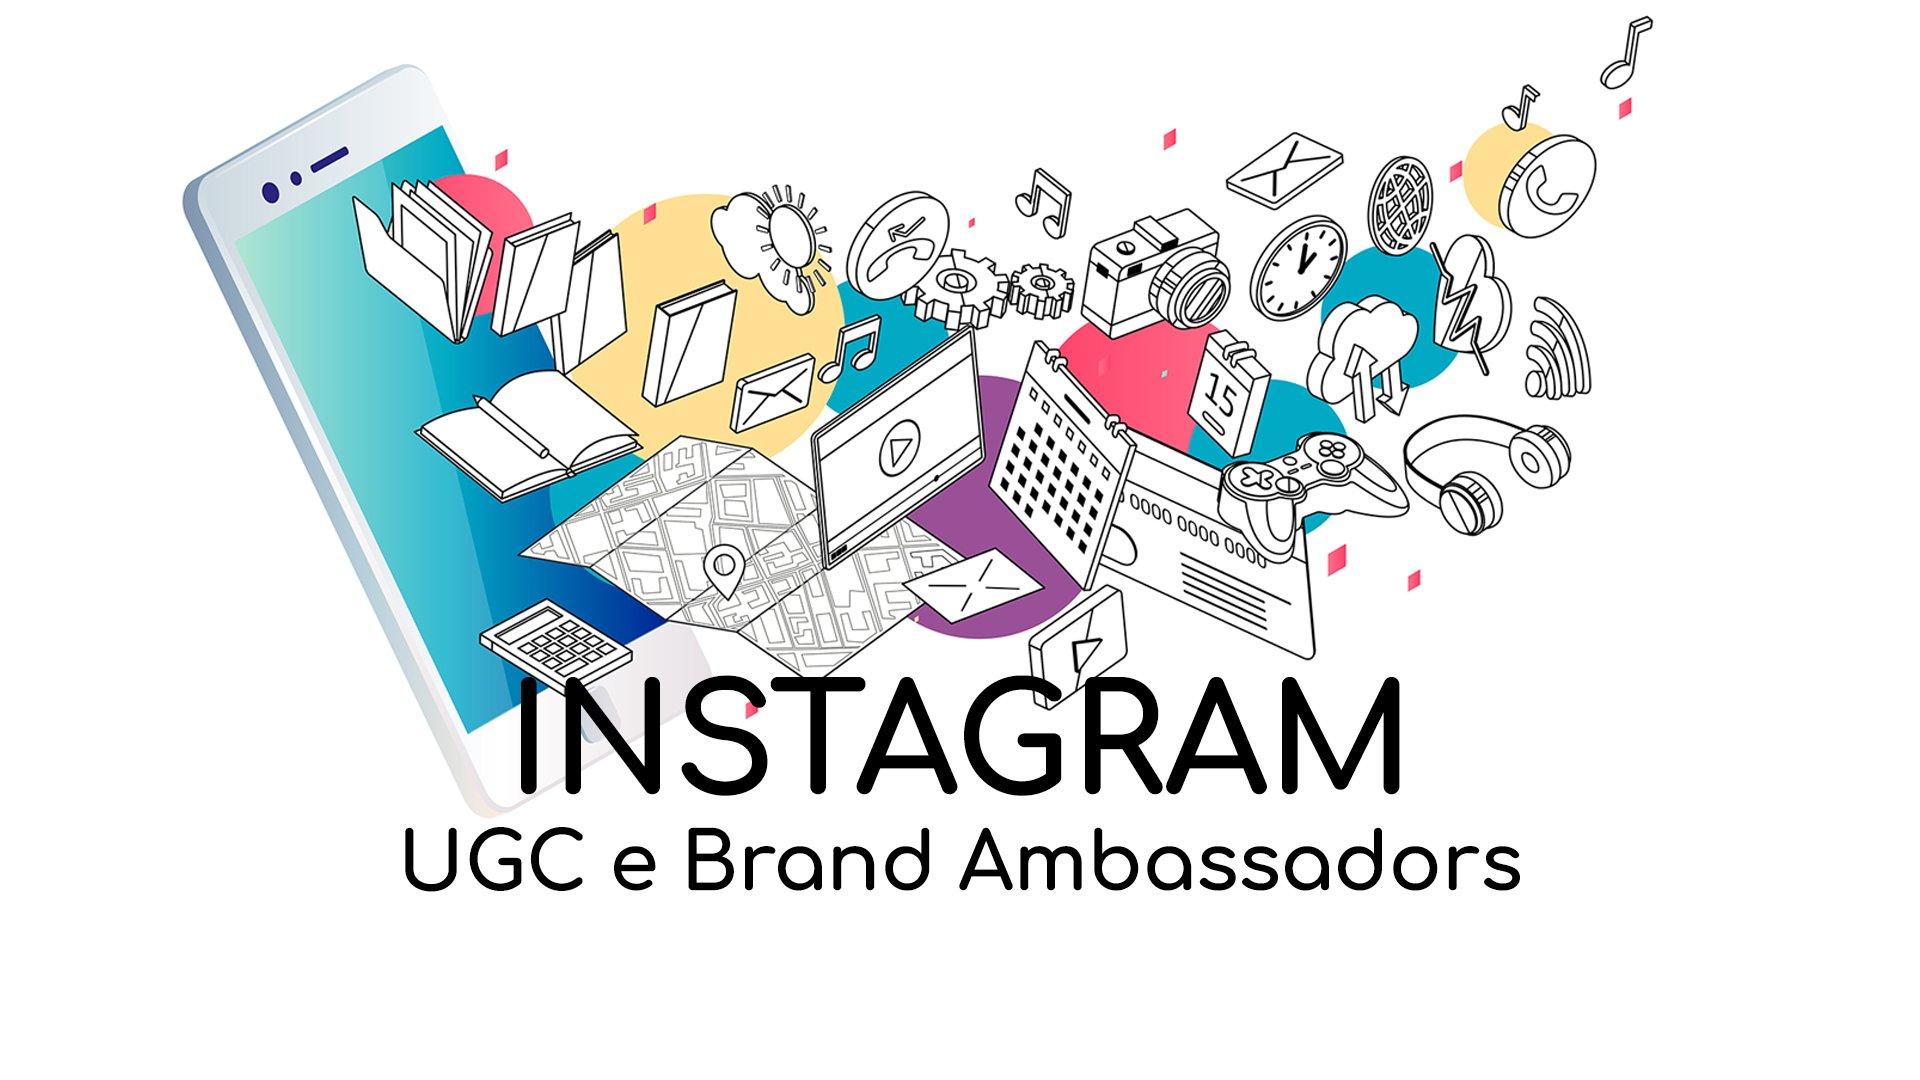 Loomen Studio Agenzia Comunicazione Roma - Social Media Instagram - UCG e brand ambassadors